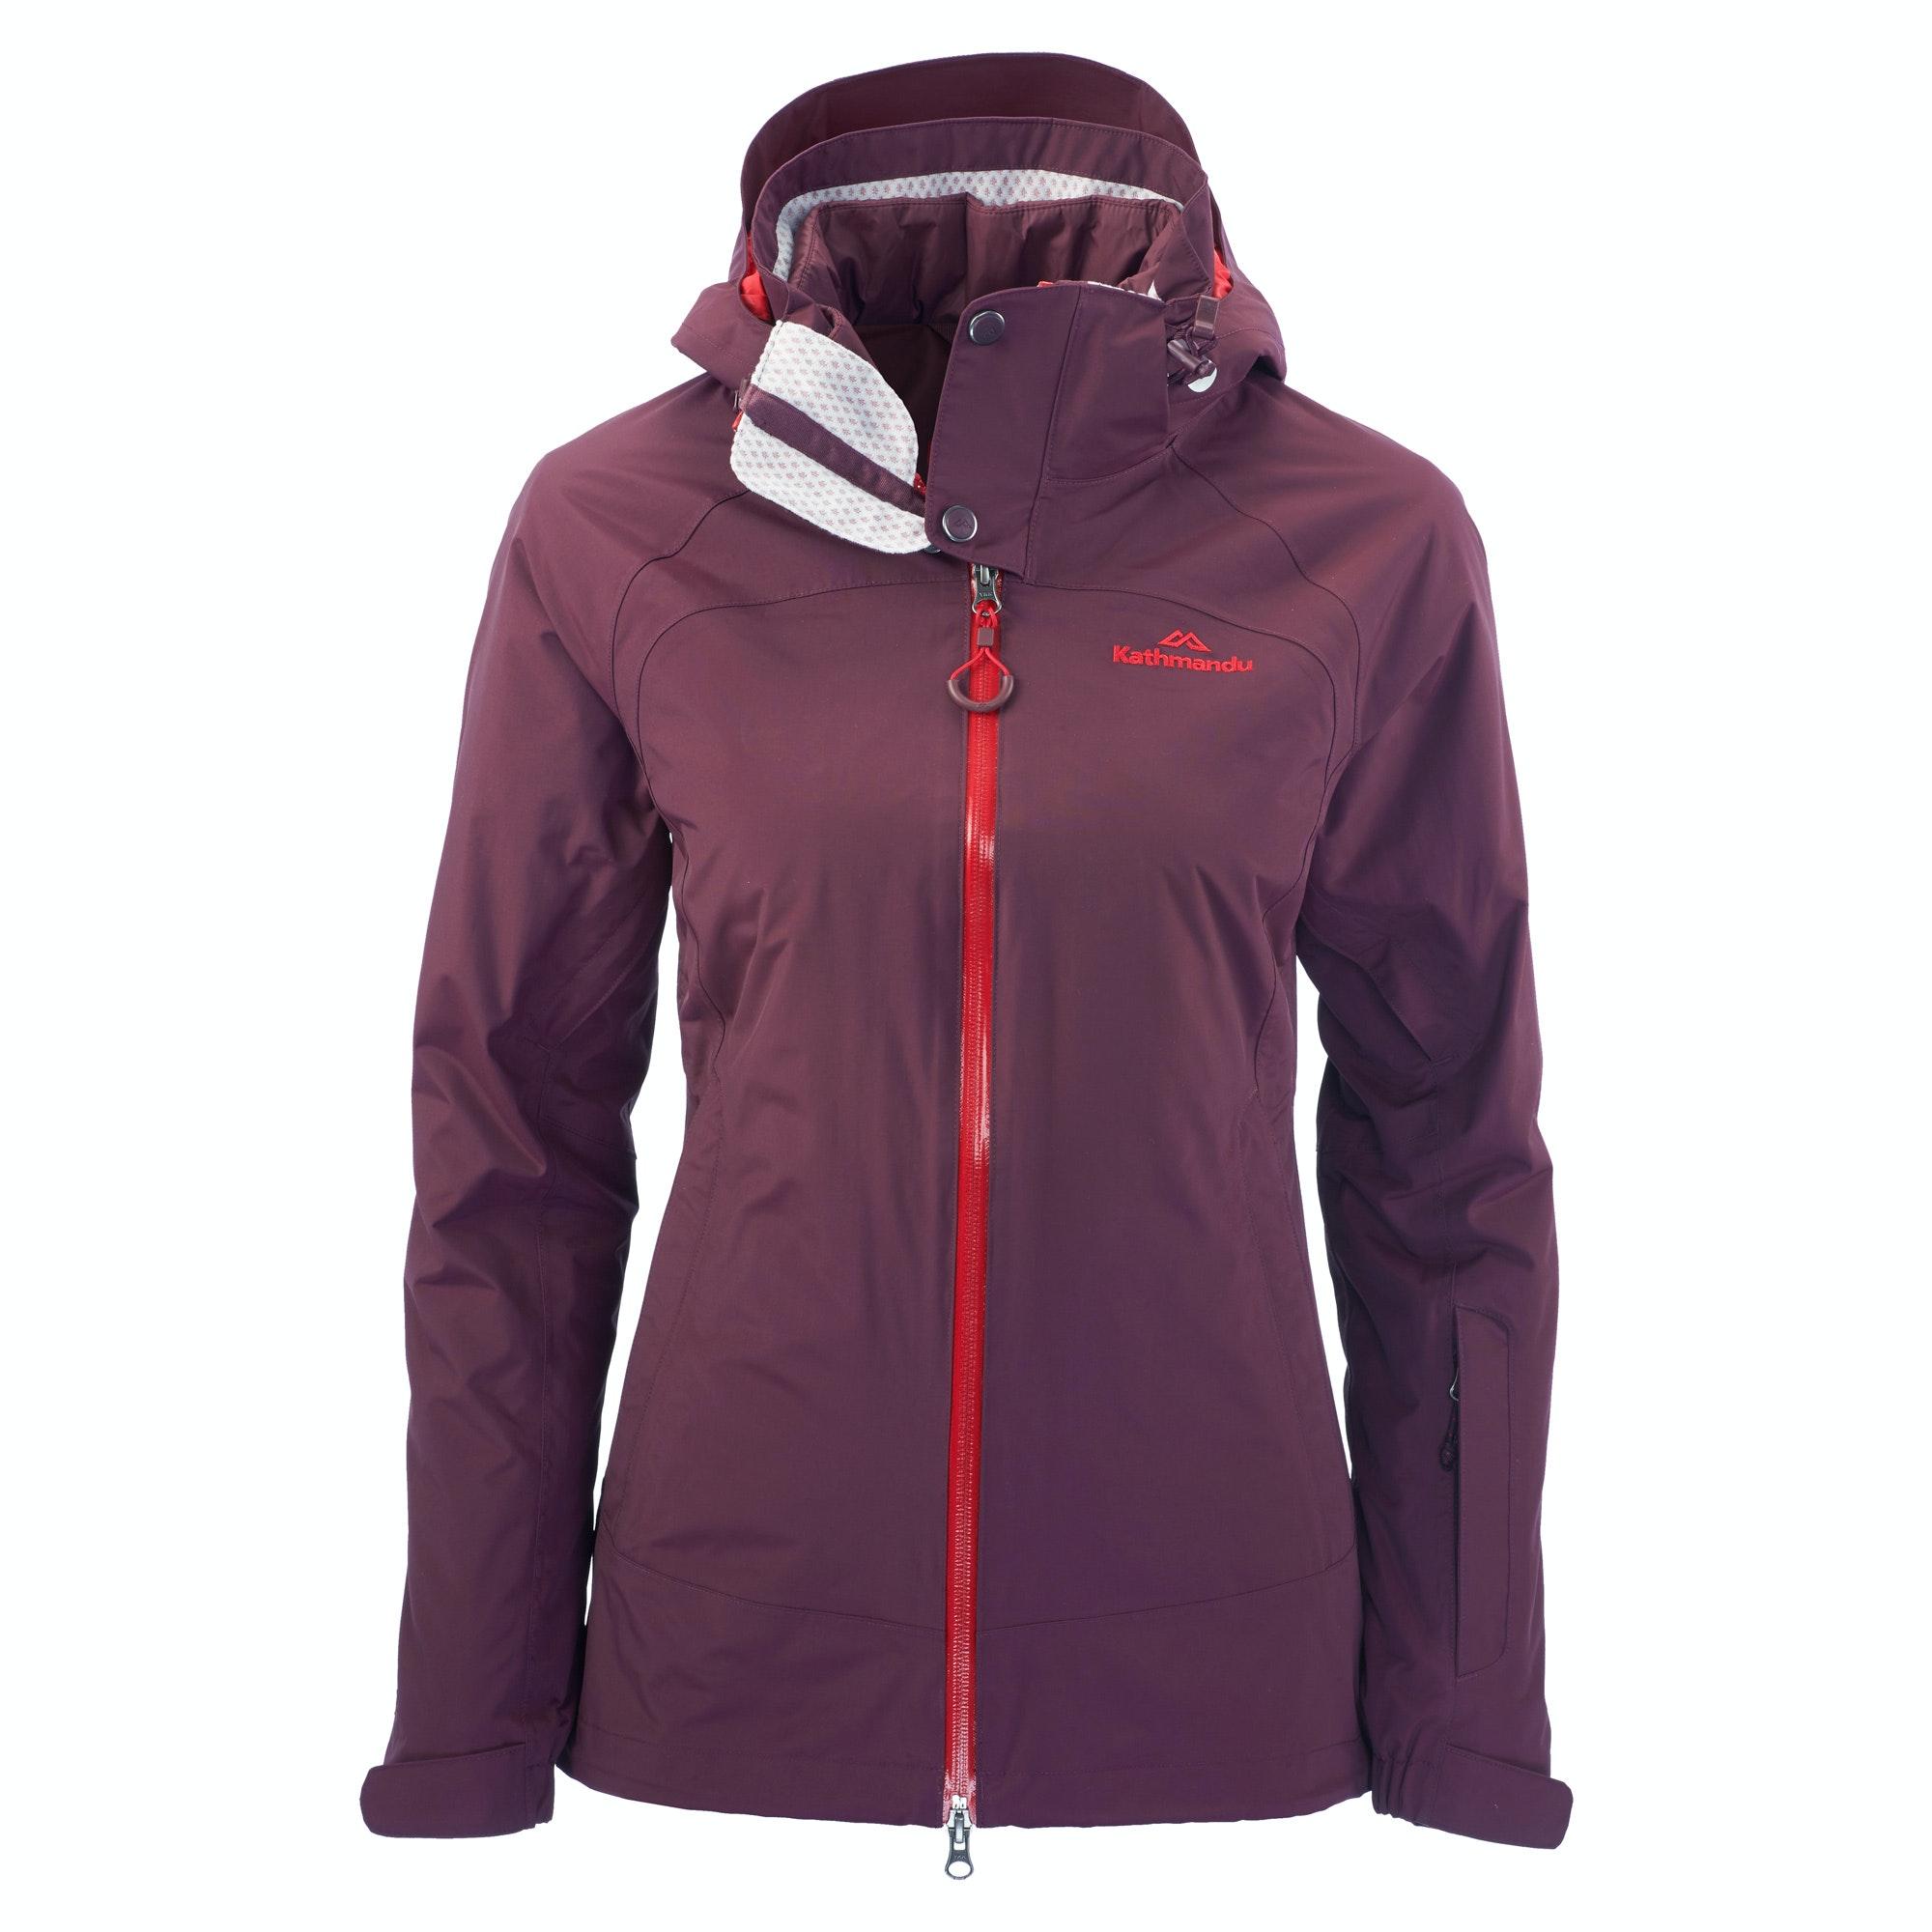 3 in 1 ski jacket womens